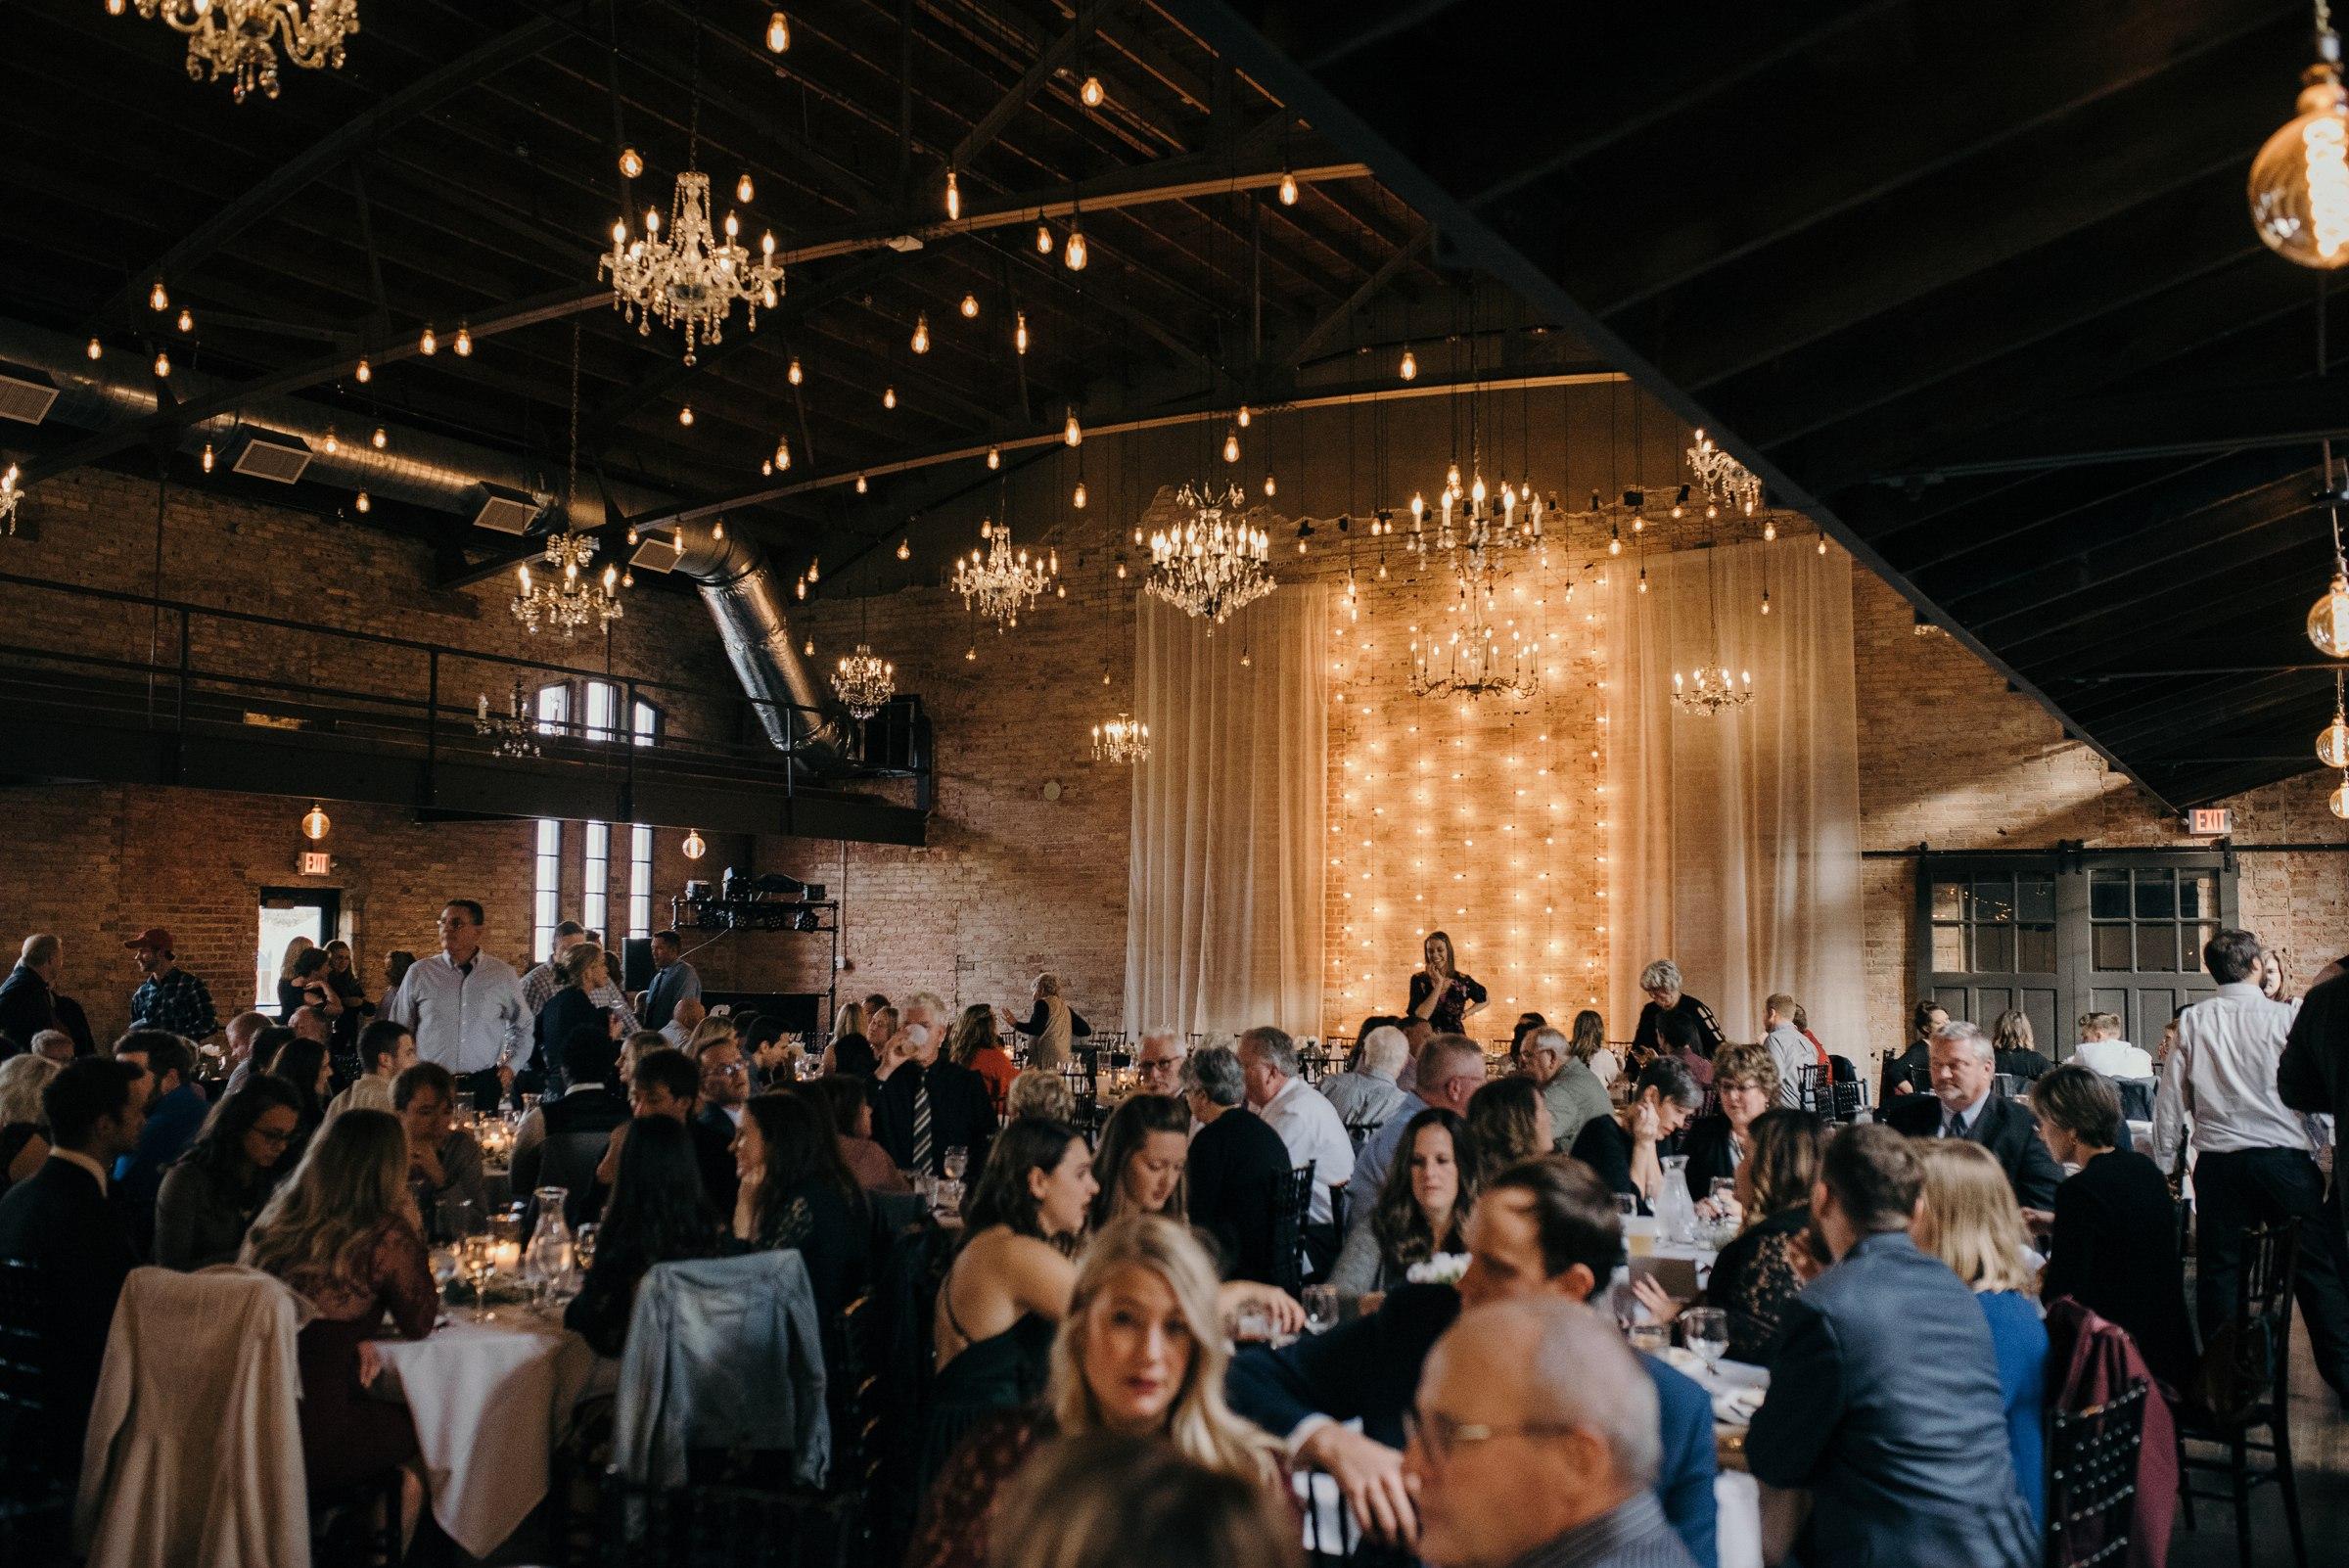 elopement-photographer-austin-best-wedding-minneapolis-adventurous-wedding-modern-morocco-new york-new orleans-mexica-costa rica-italy-affordable-best_0063.jpg